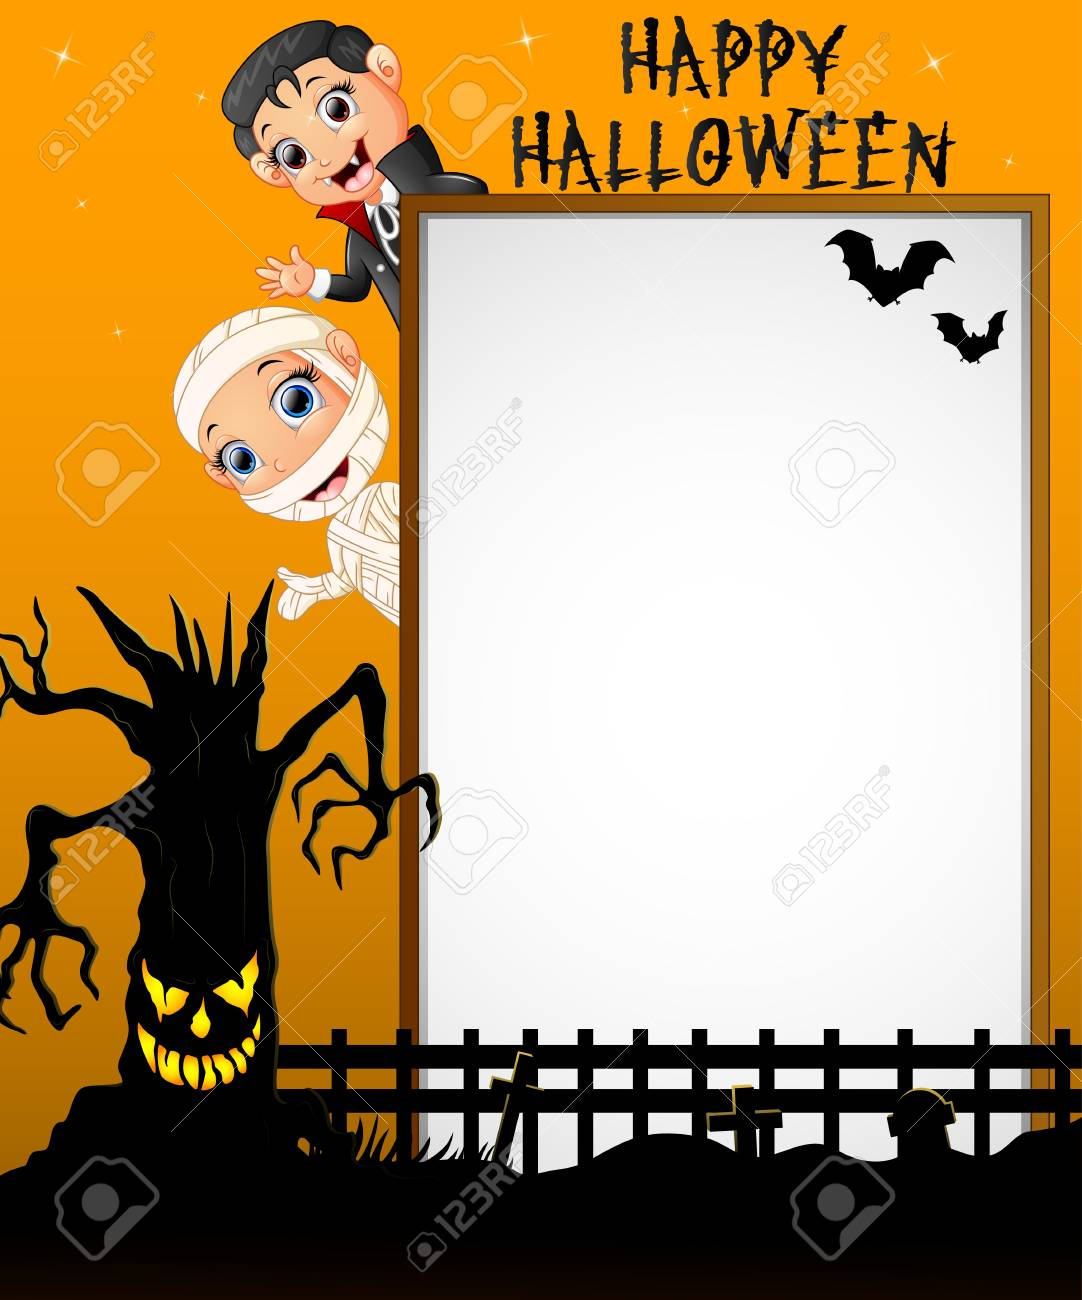 halloween sign with little mummy and little boy dracula while rh 123rf com Halloween Cat Vector Halloween Moon Vector